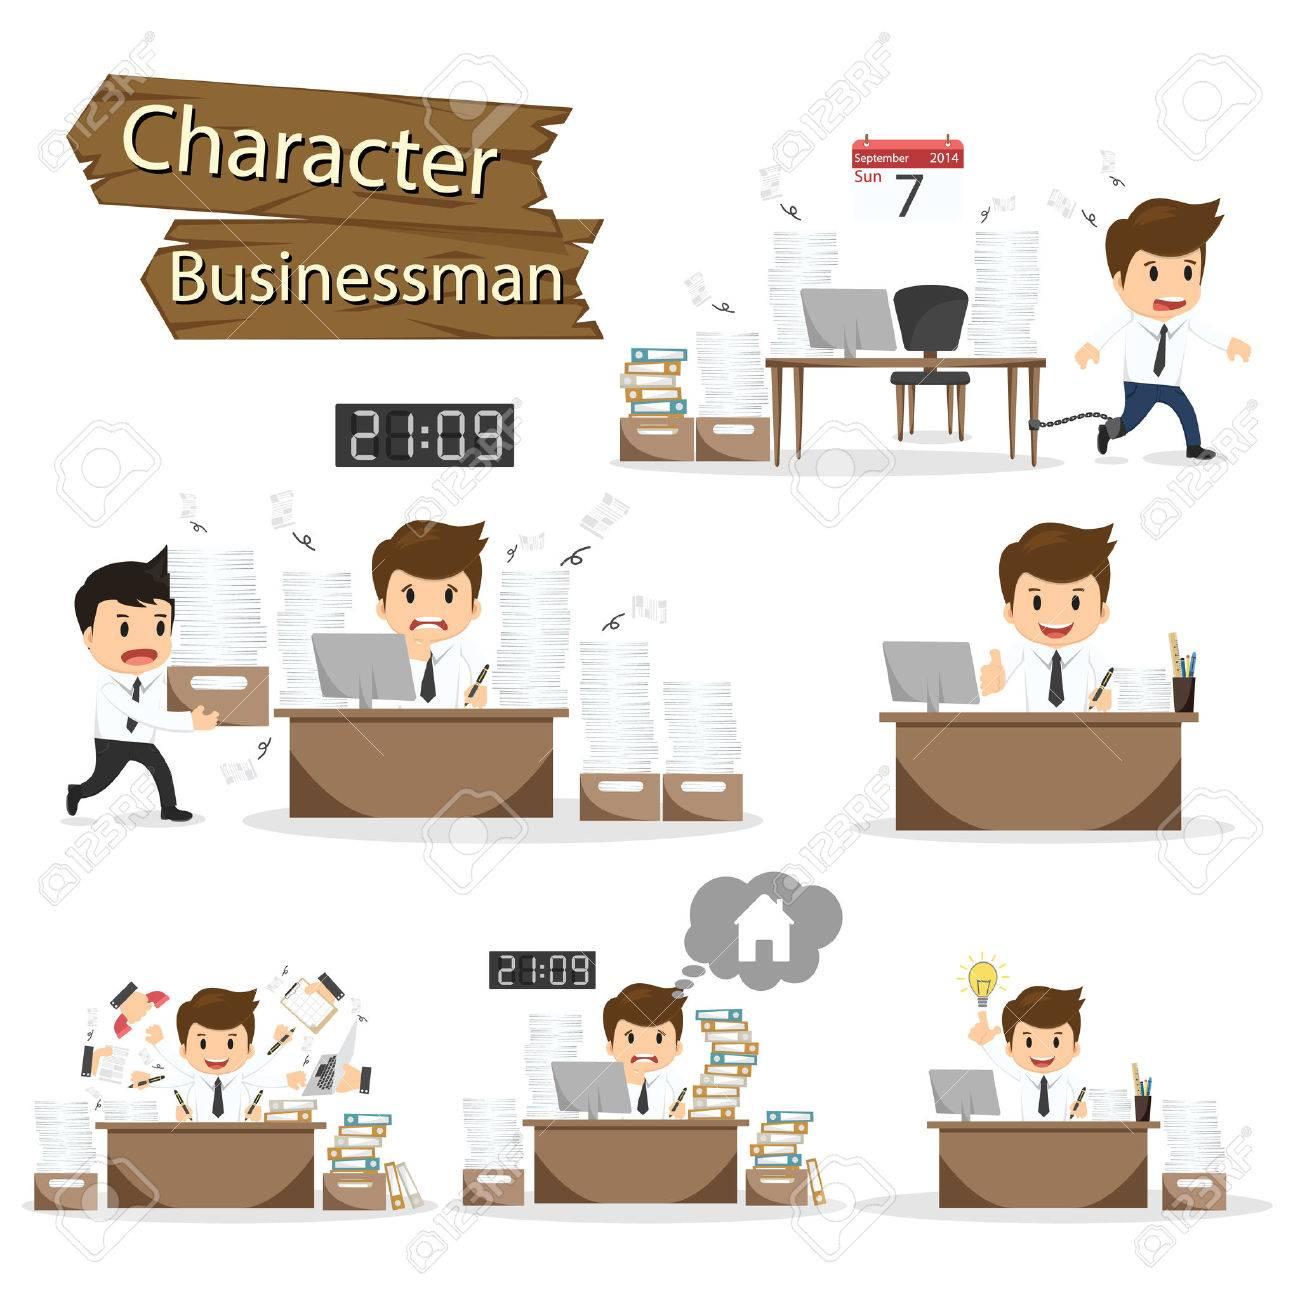 Businessman character on office worker set vector illustration. - 45588495